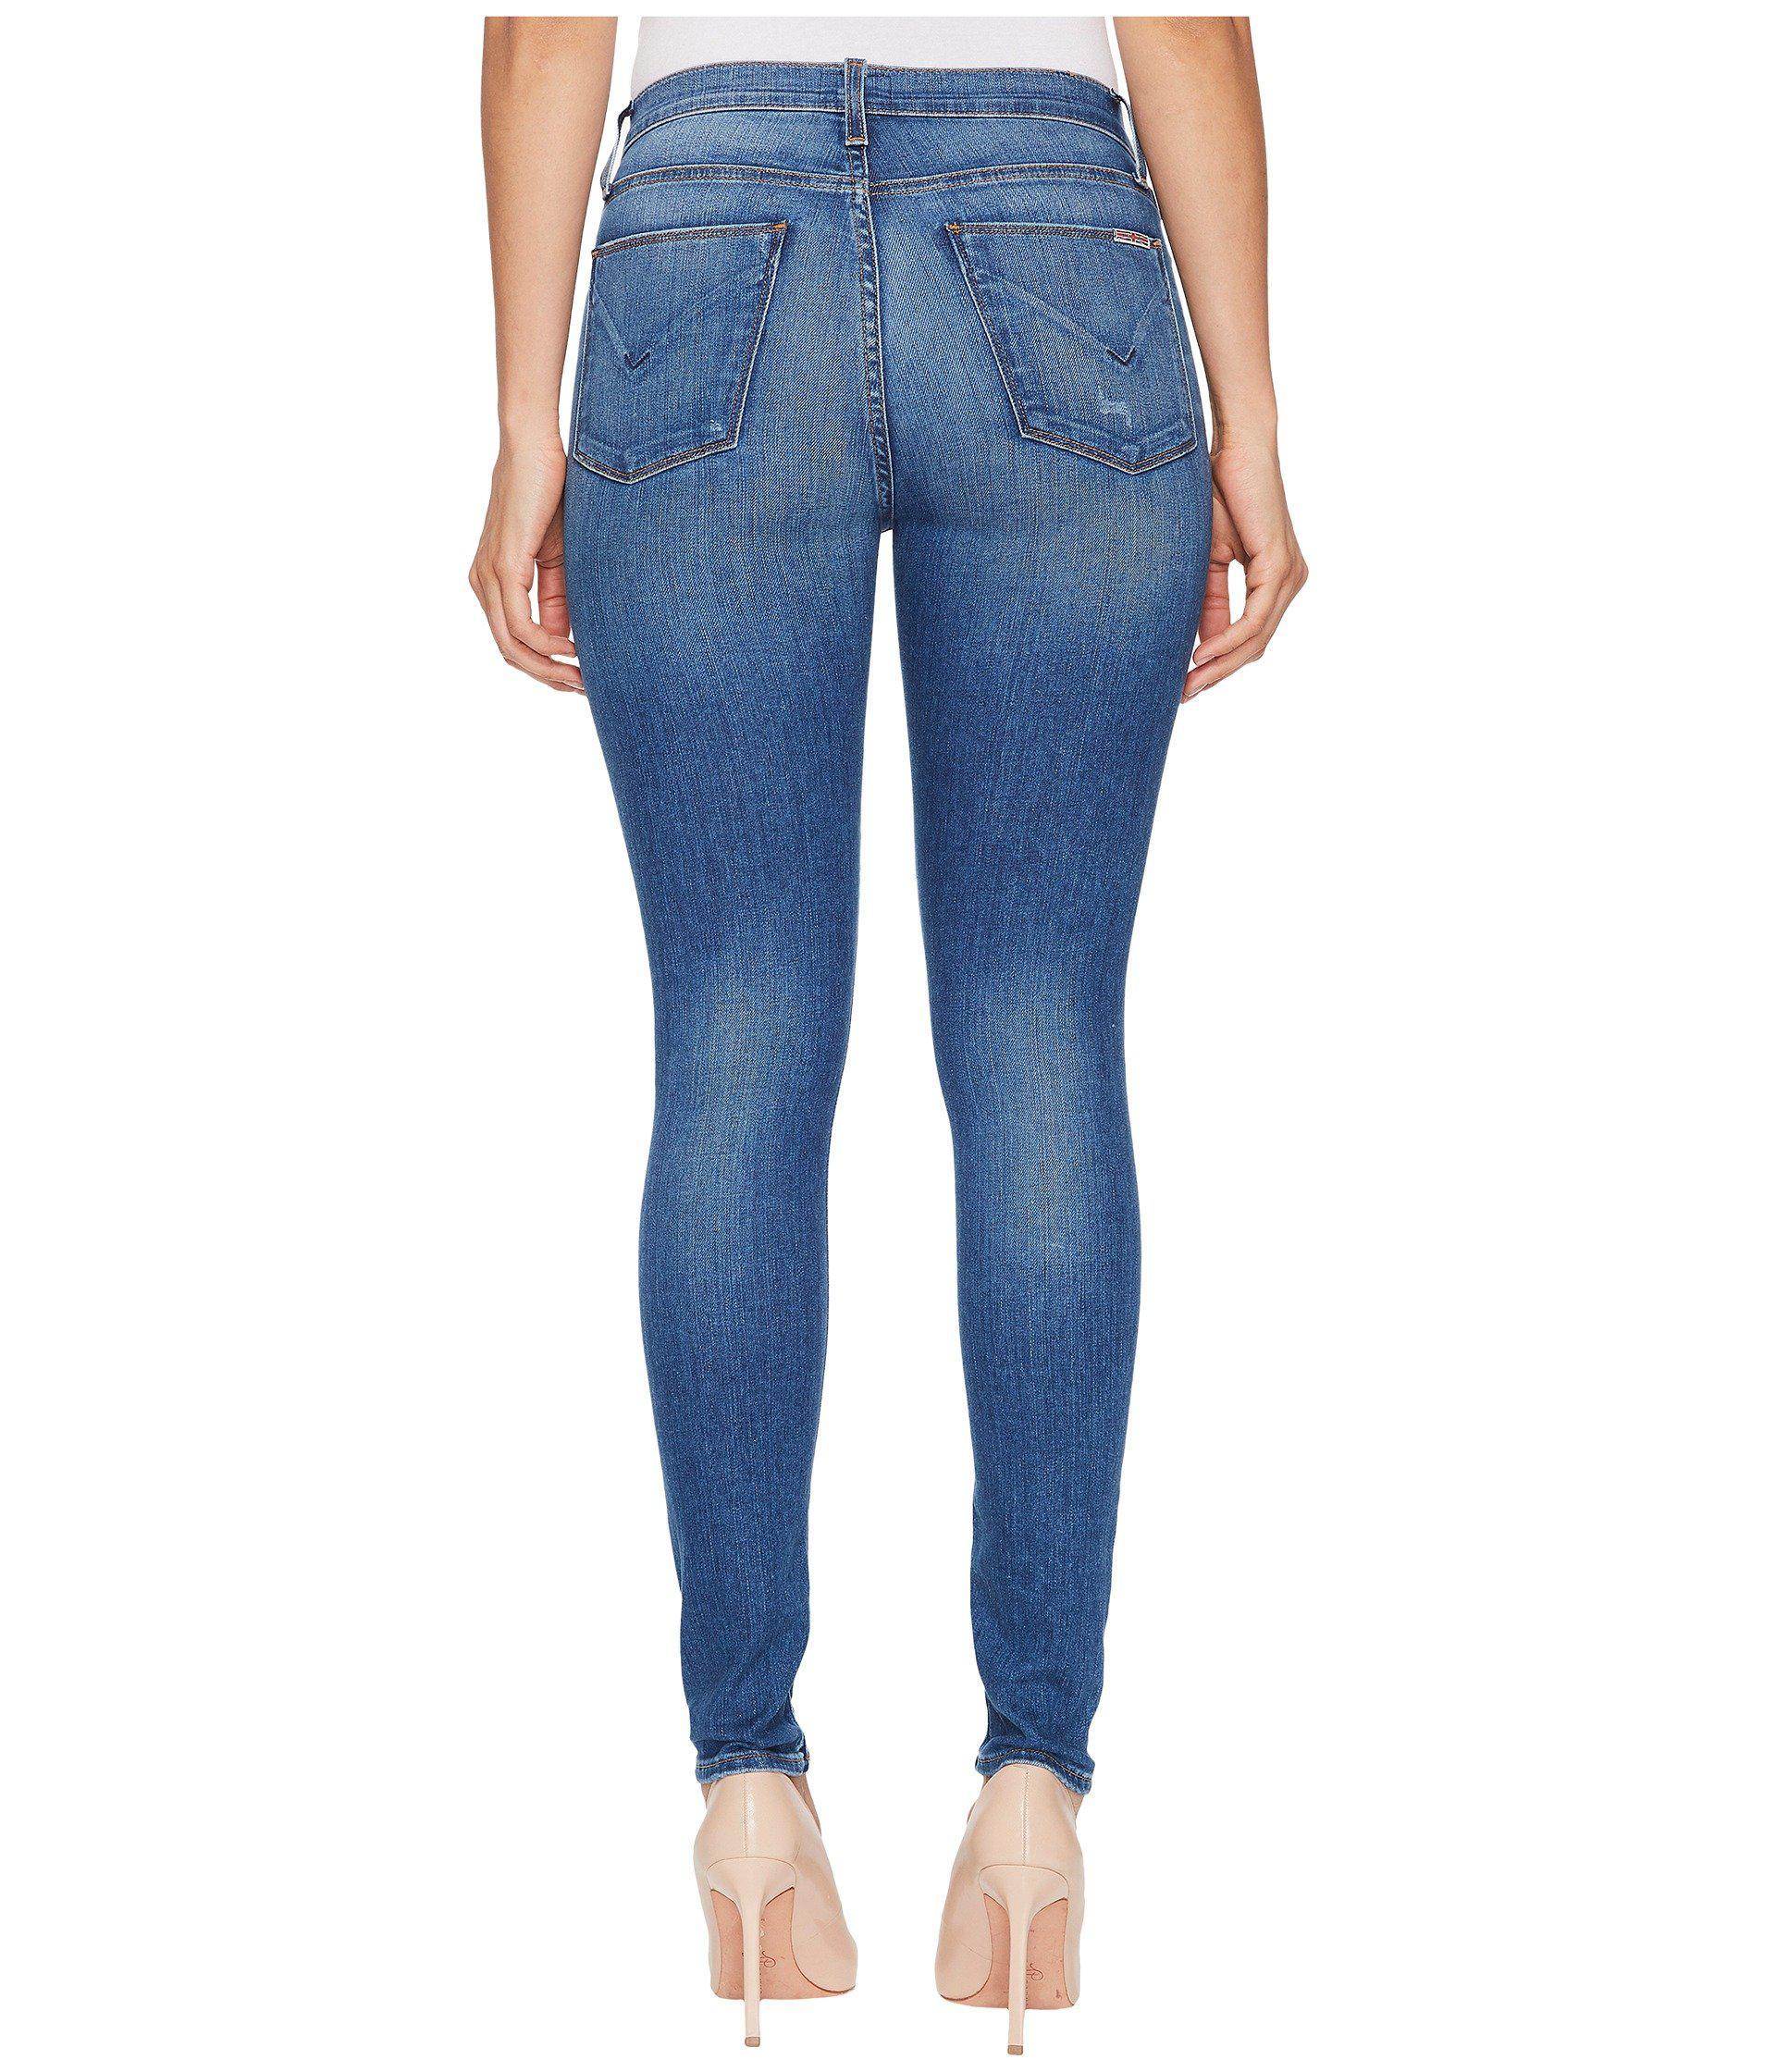 649d2157569 Hudson Jeans Barbara High-waist Super Skinny Jeans In Ultralight ...